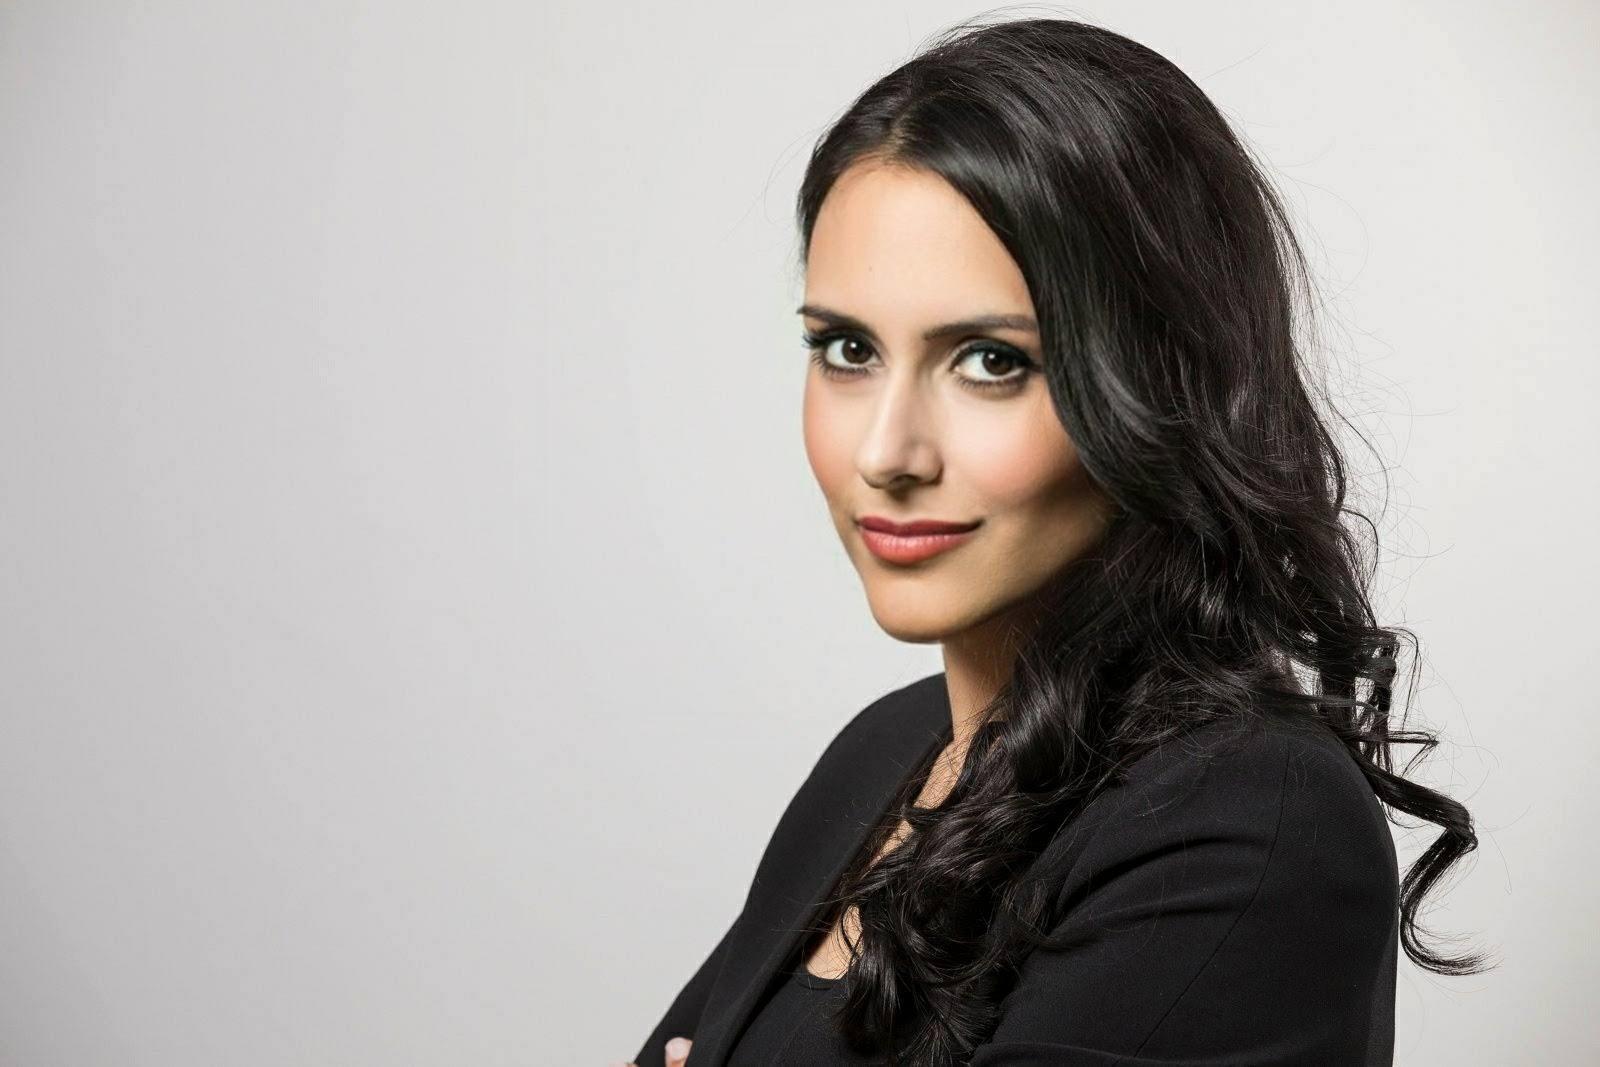 Strafverteidigung Köln Rechtsanwältin